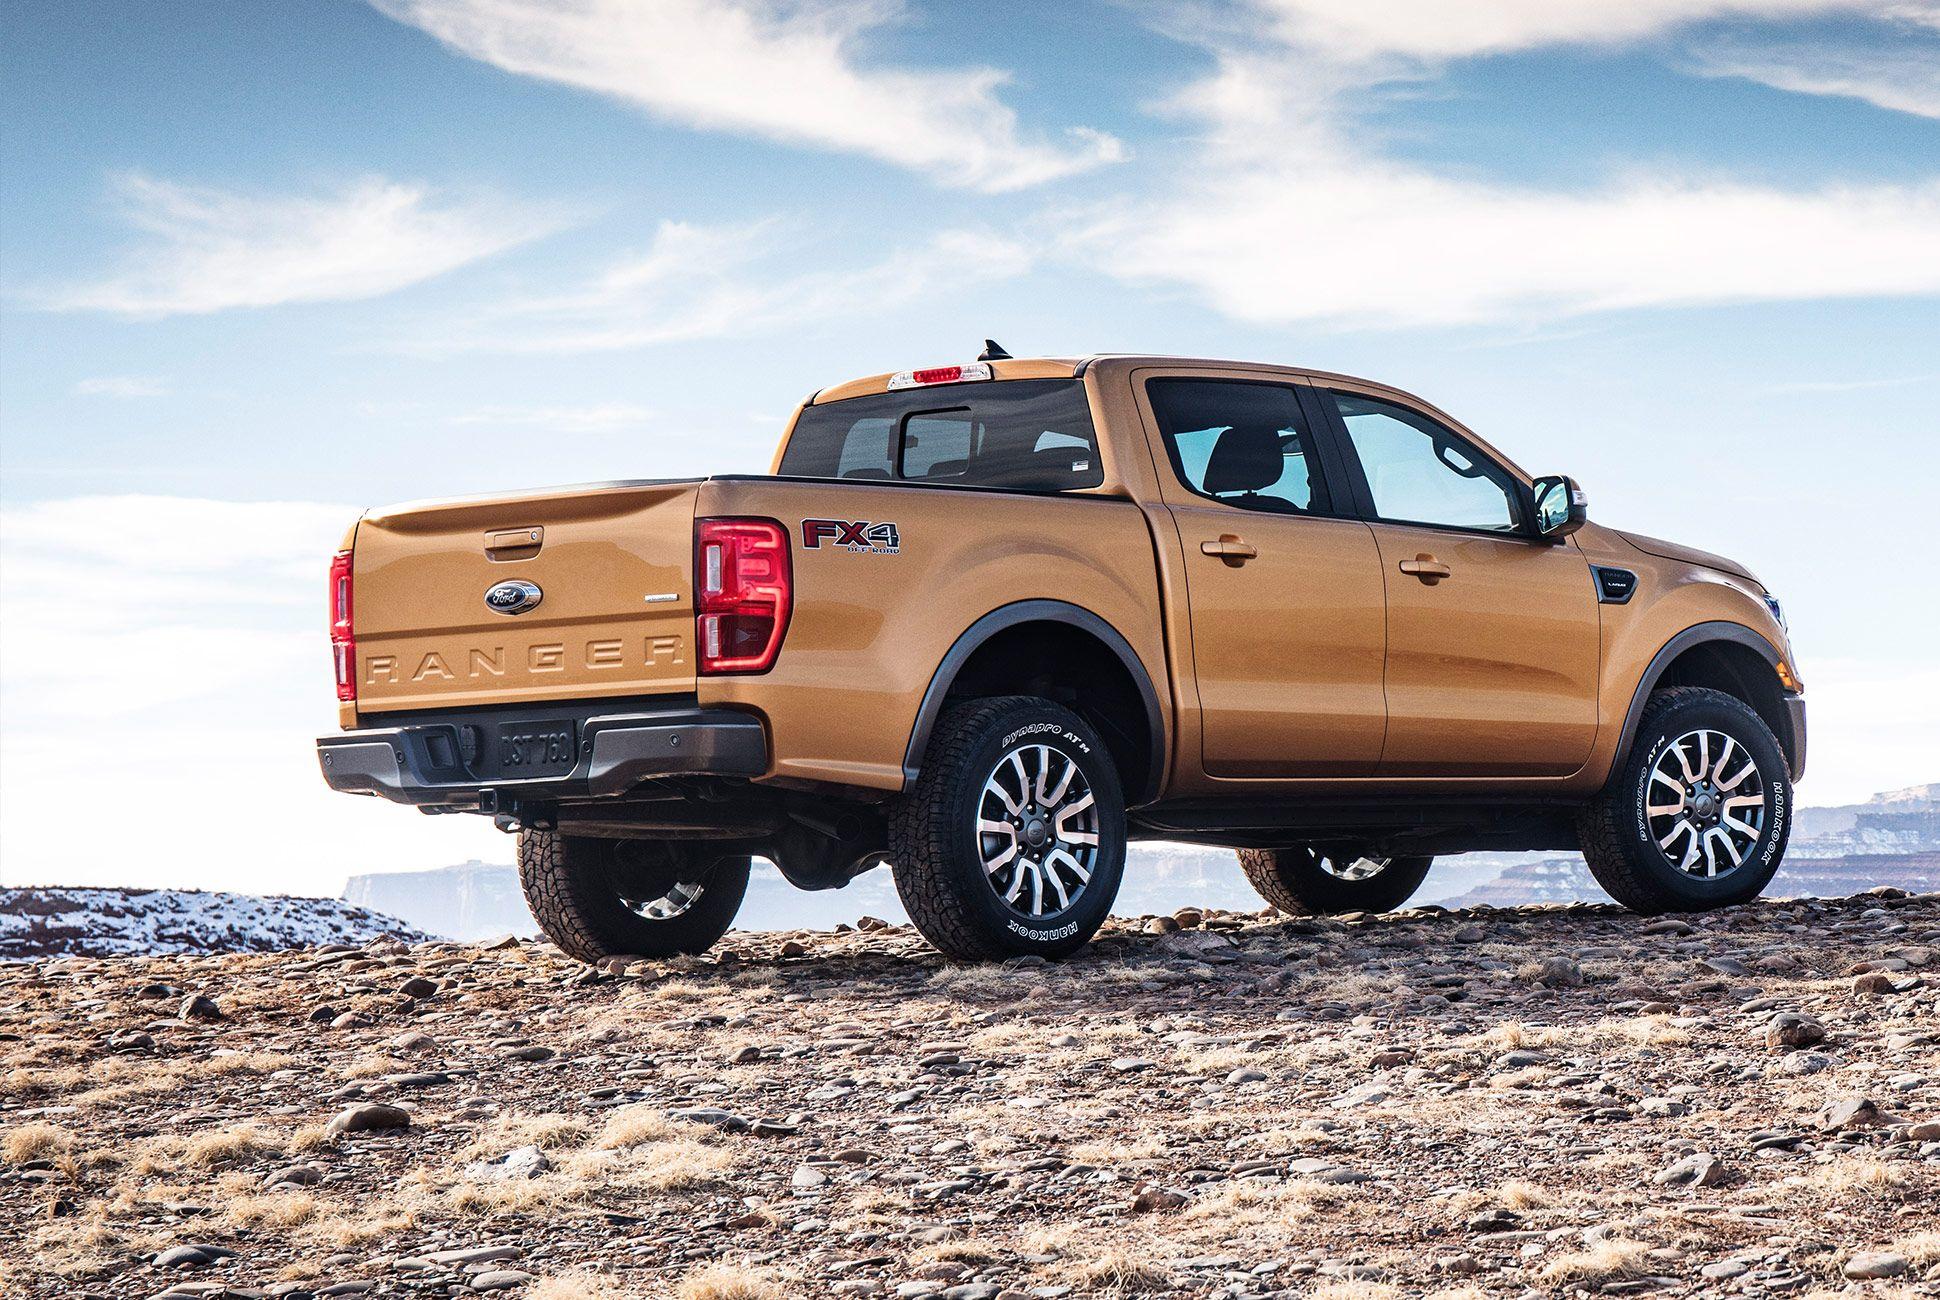 Ford-Ranger-gear-patrol-9